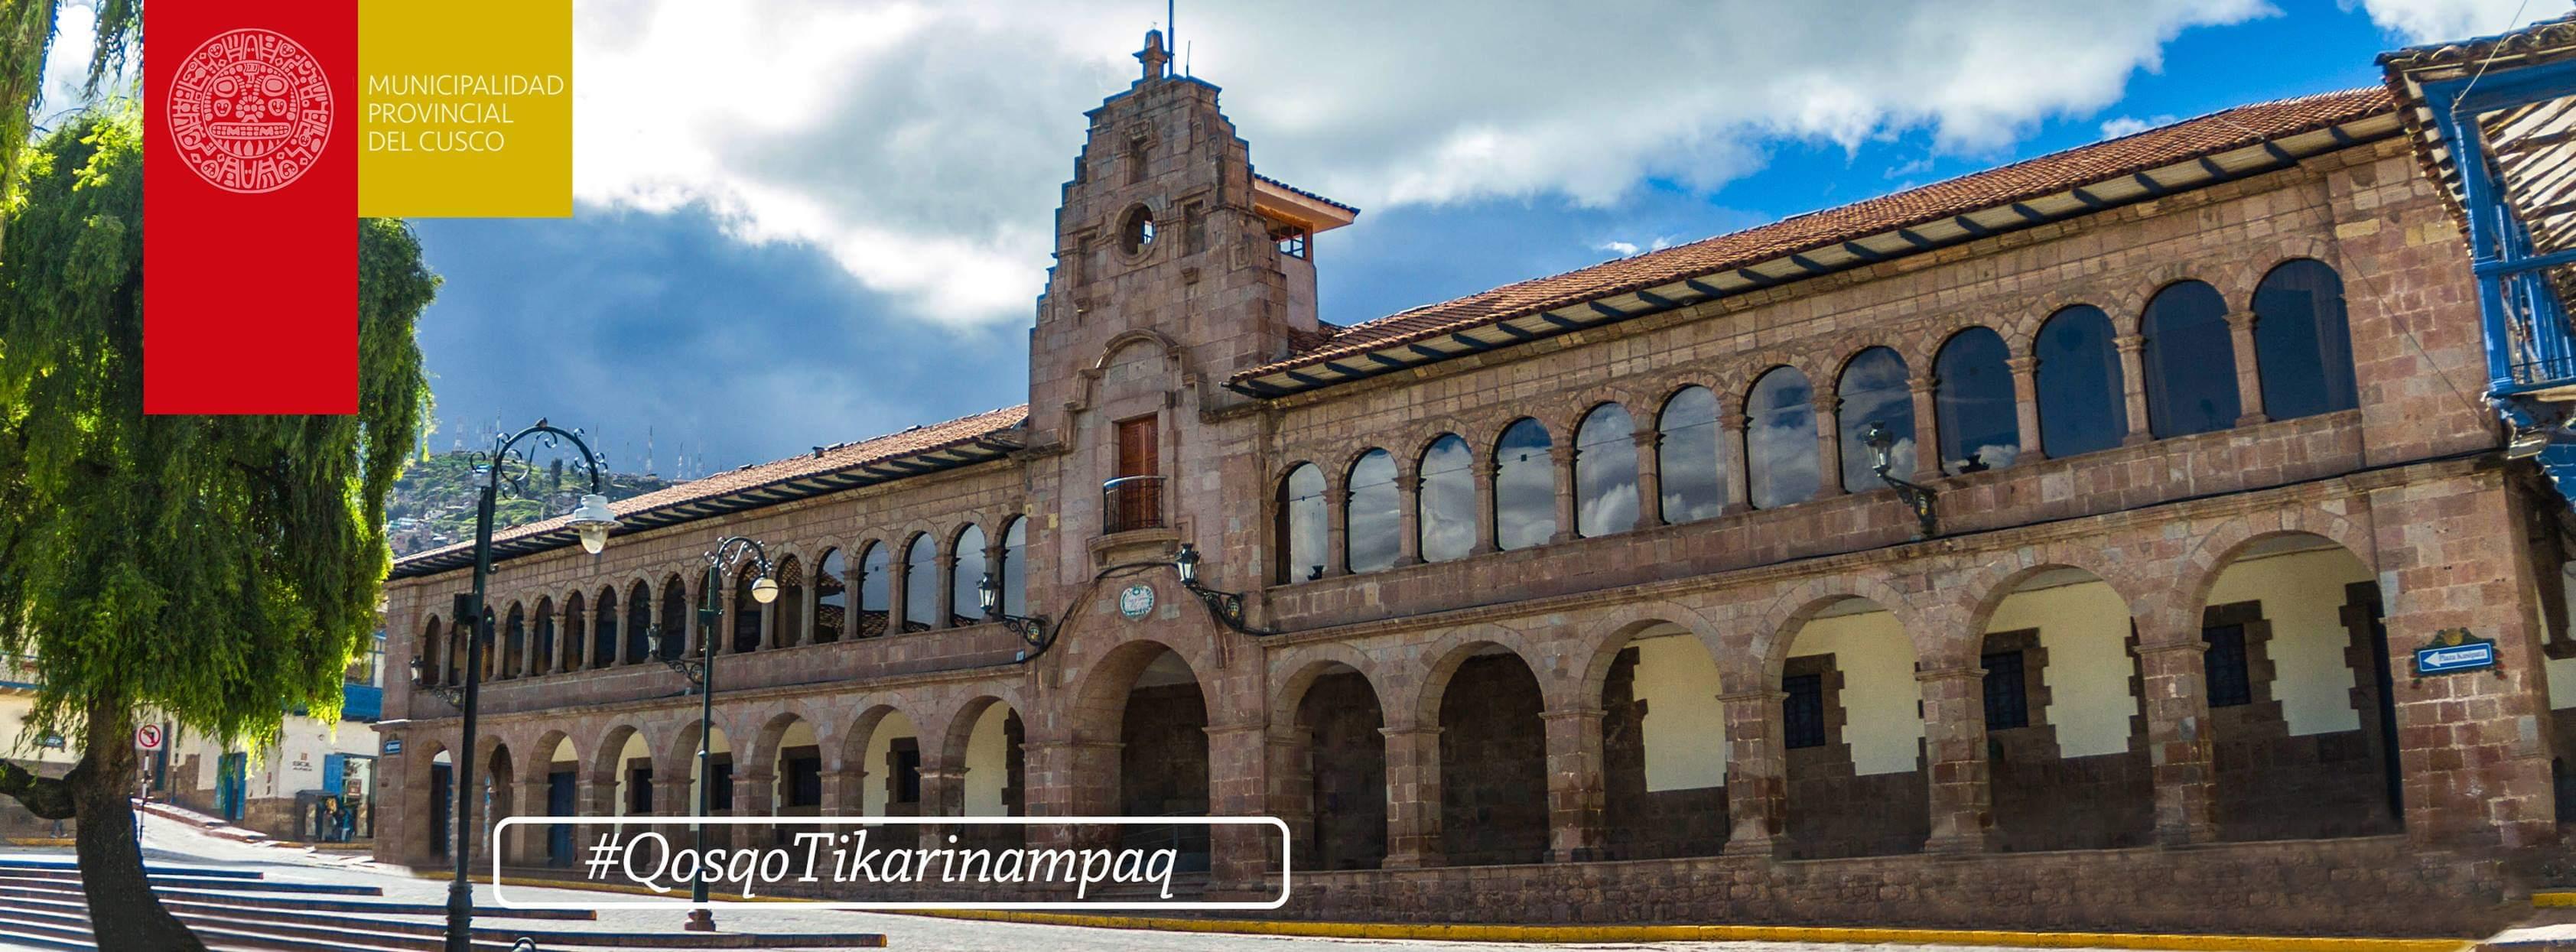 Municipalidad Provincial del Cusco